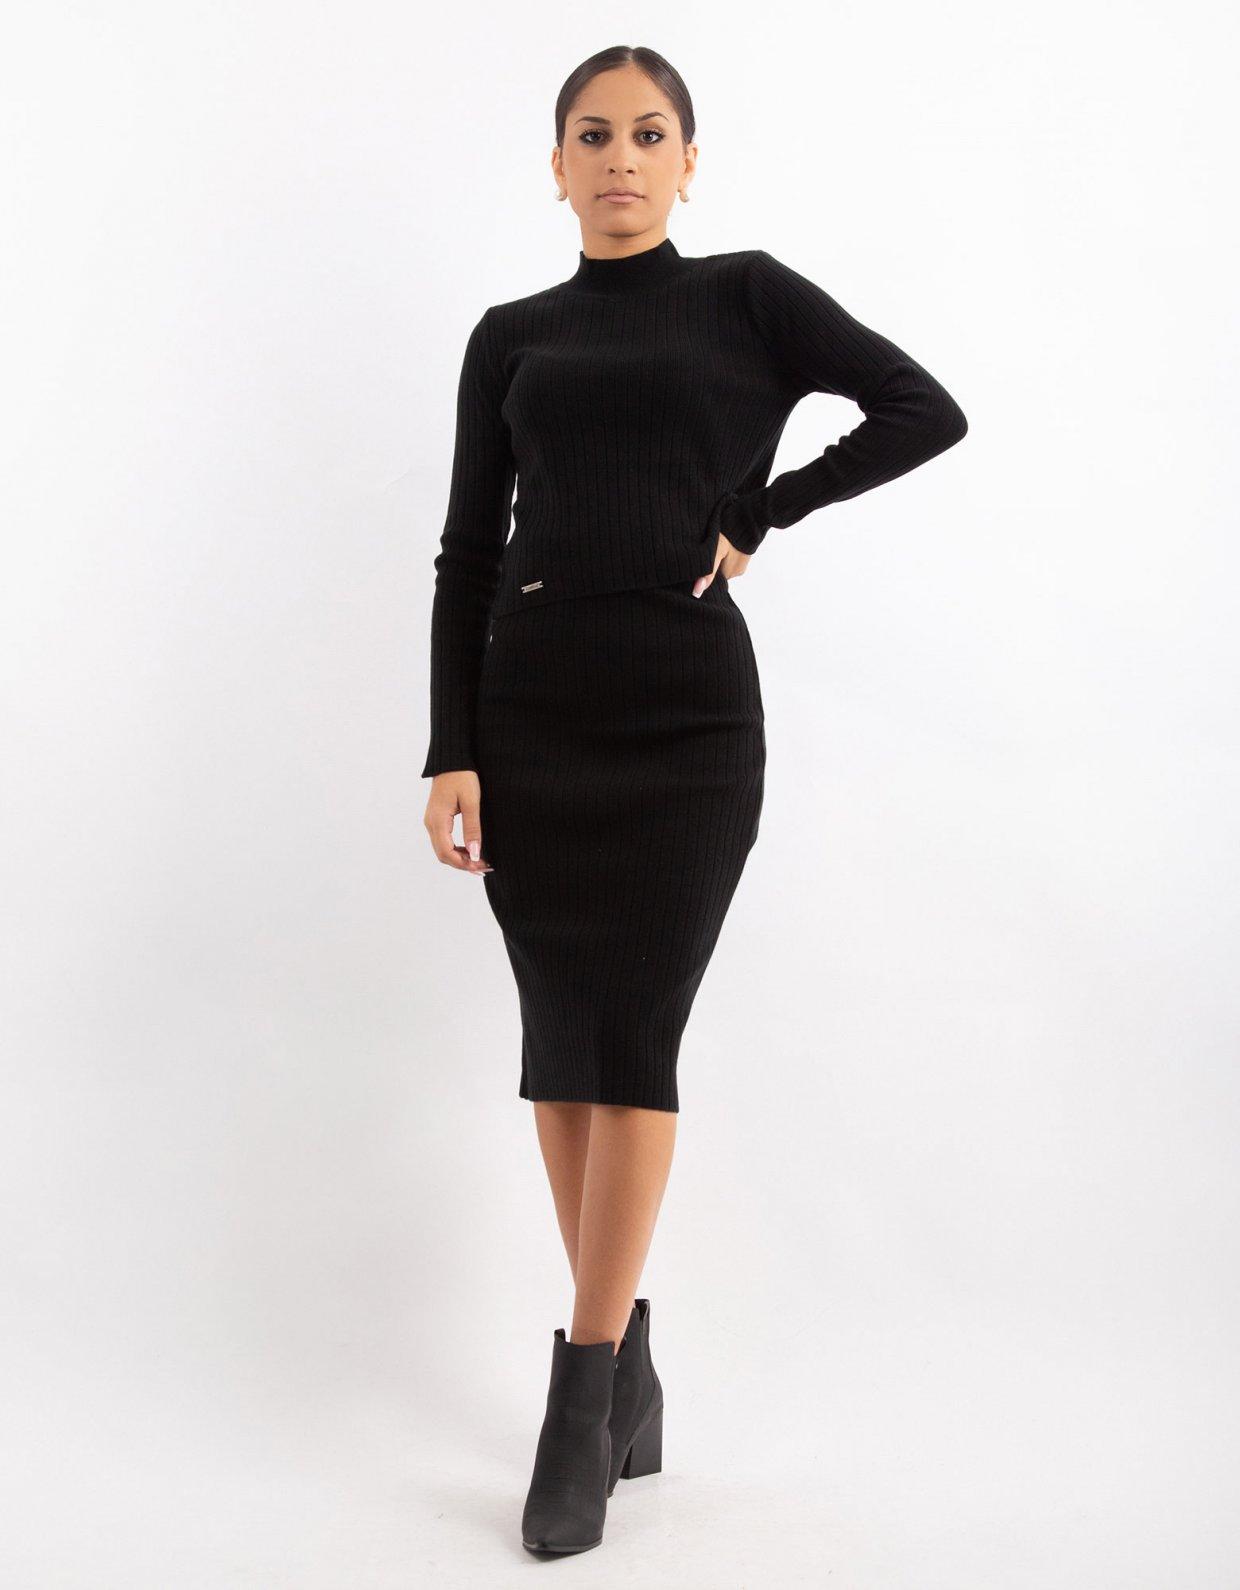 Combos Knitwear Combos W15 – Black rib turtleneck top